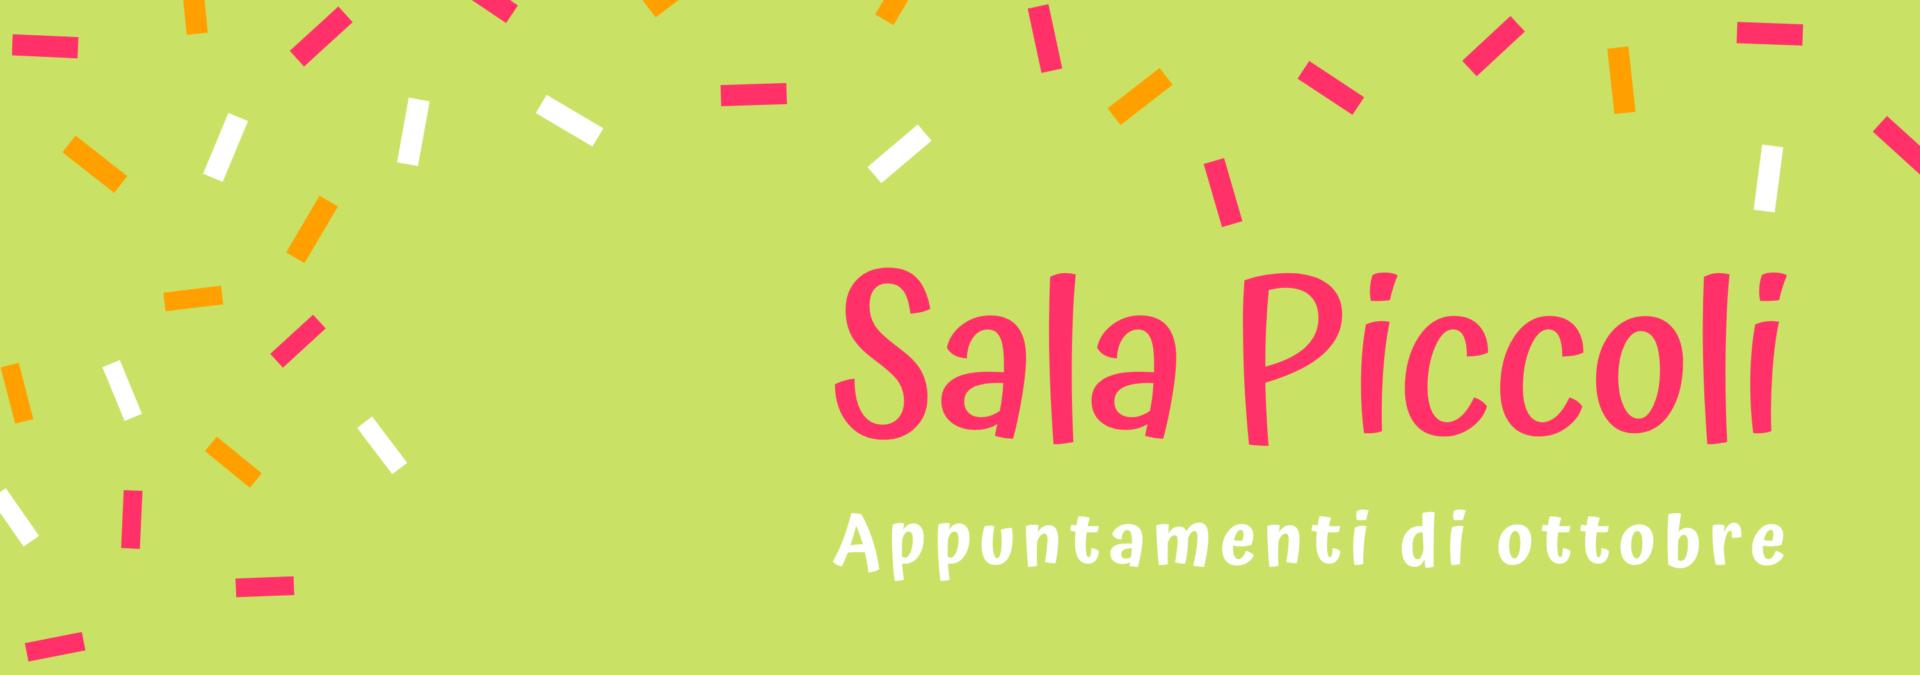 Appuntamenti di ottobre in Sala Piccoli